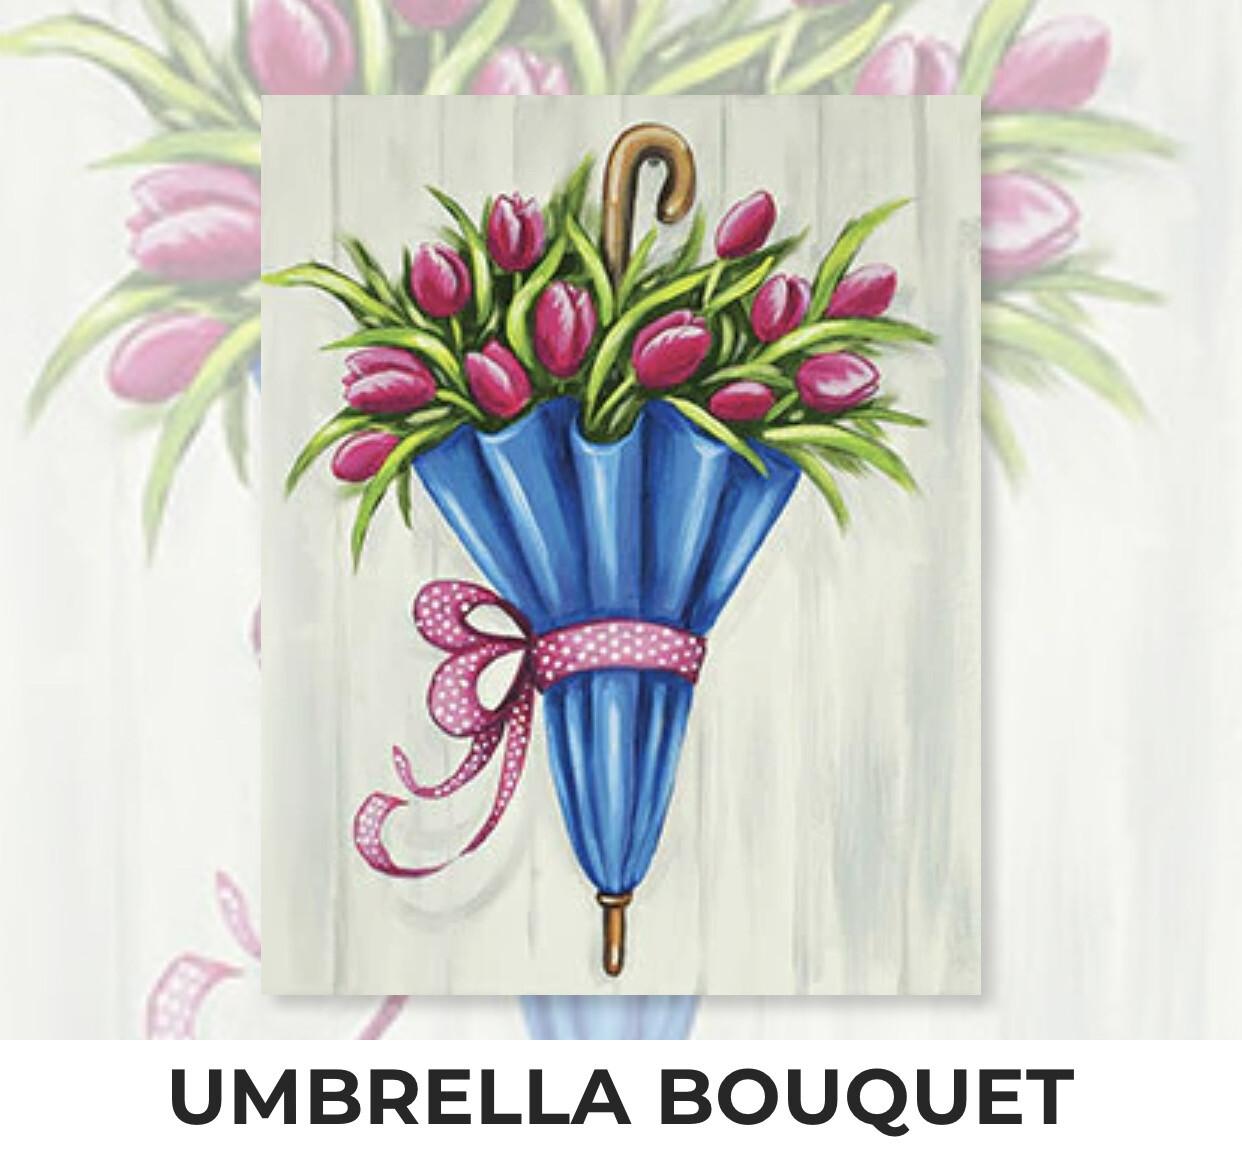 Umbrella Bouquet ADULT Acrylic Paint On Canvas DIY Art Kit - 3 Week Special Order